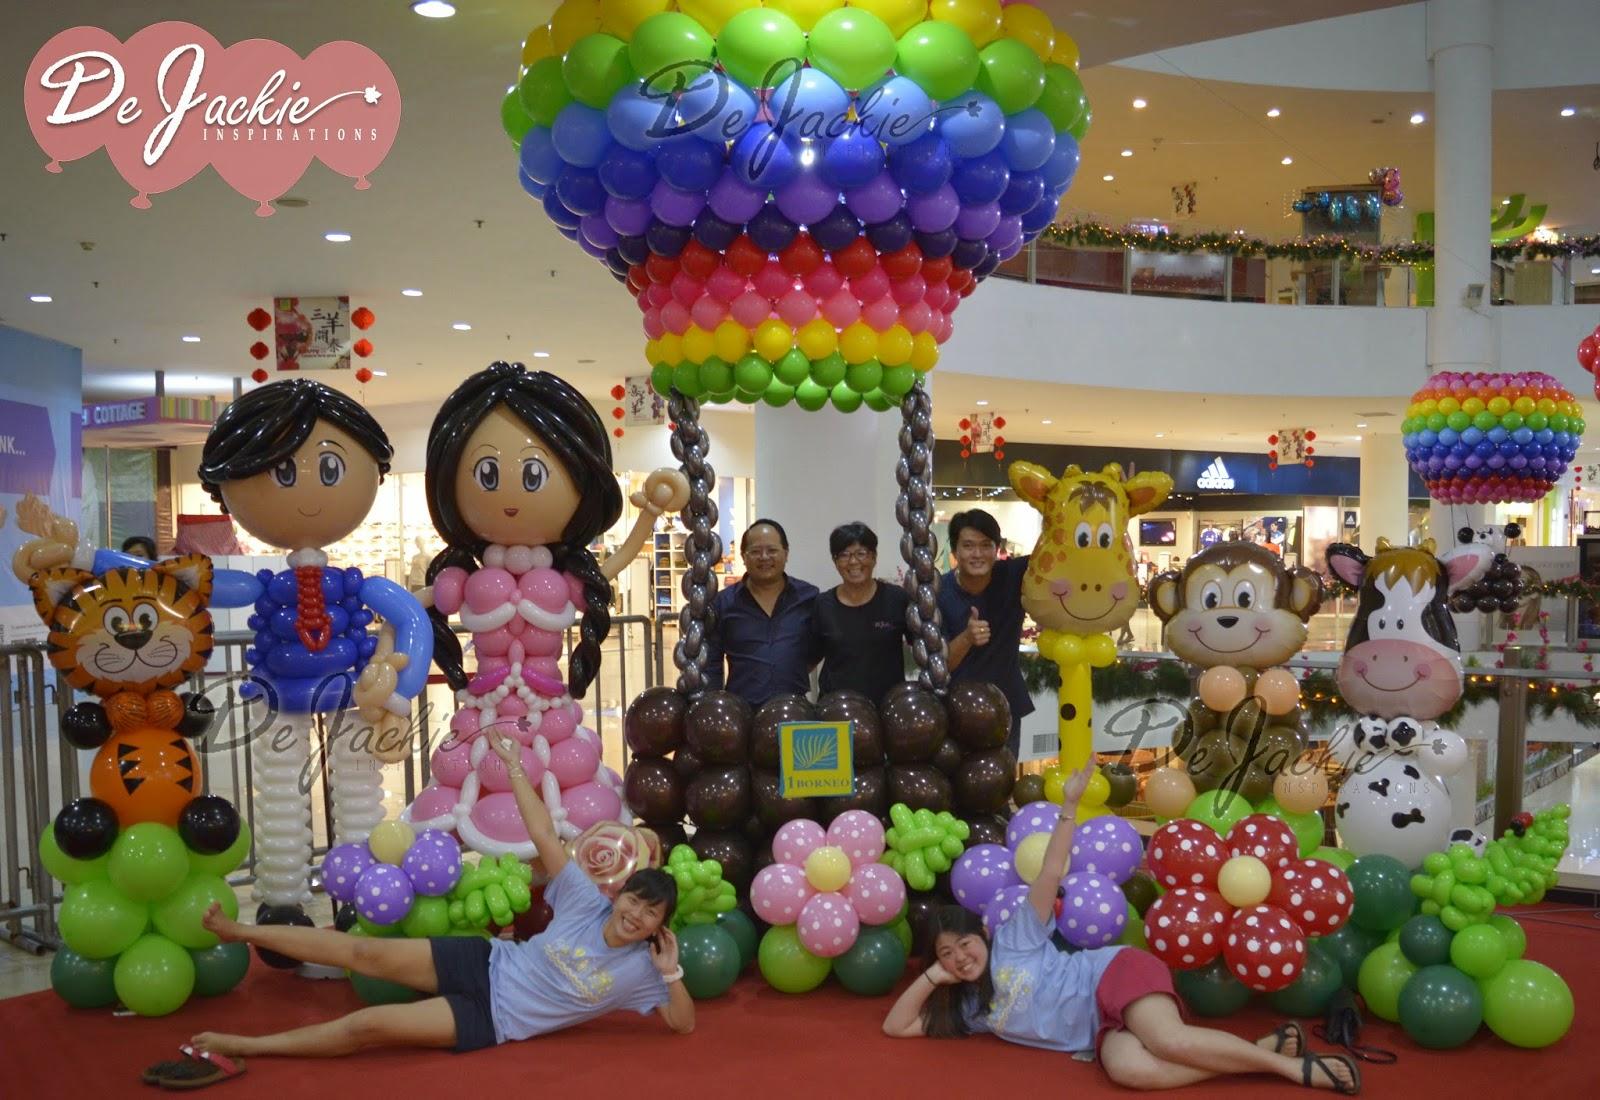 Balloon decorations for weddings birthday parties for Balloon decoration companies